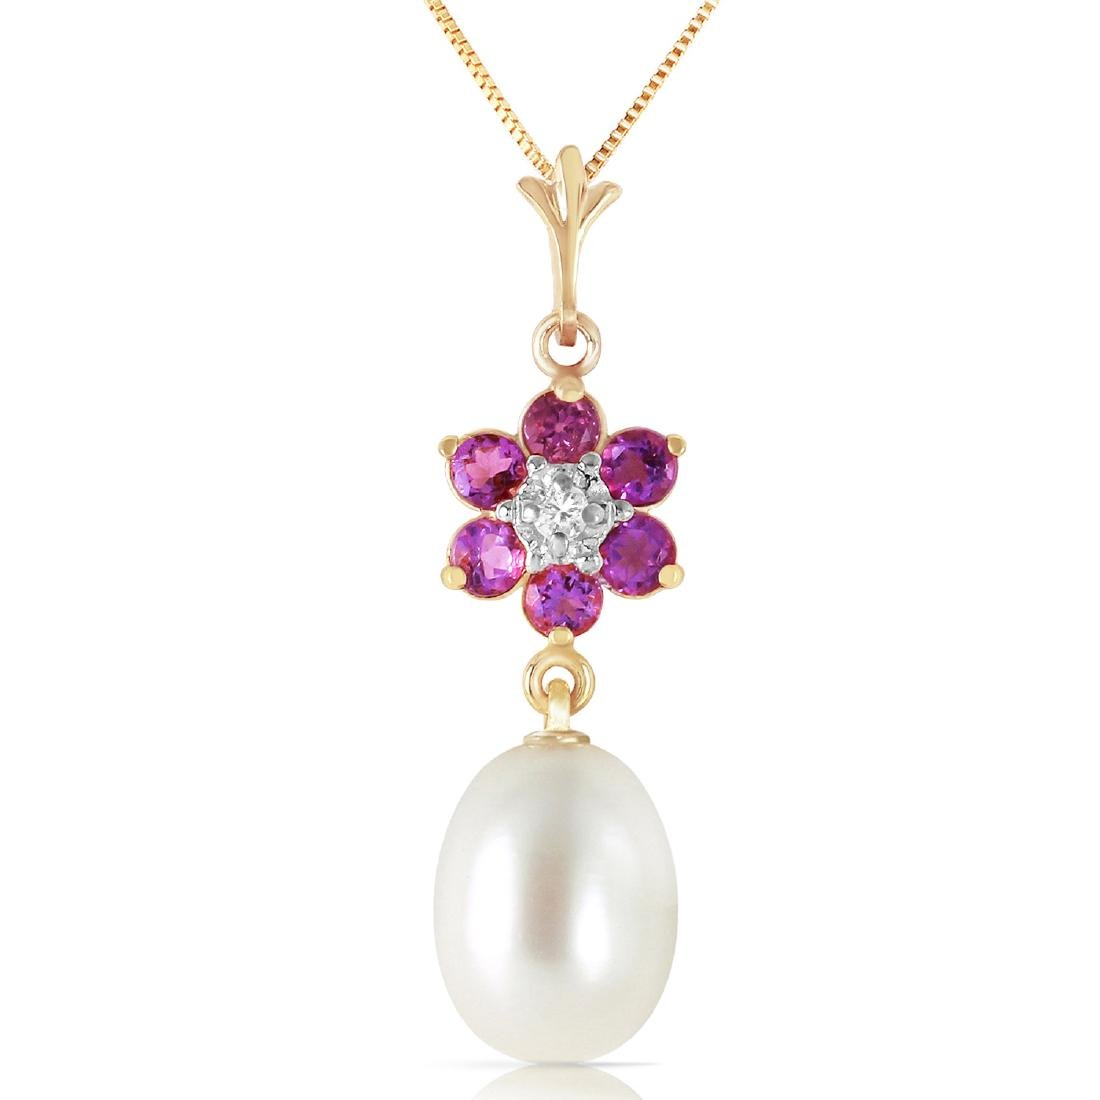 Genuine 4.53 ctw Pearl, Amethyst & Diamond Necklace